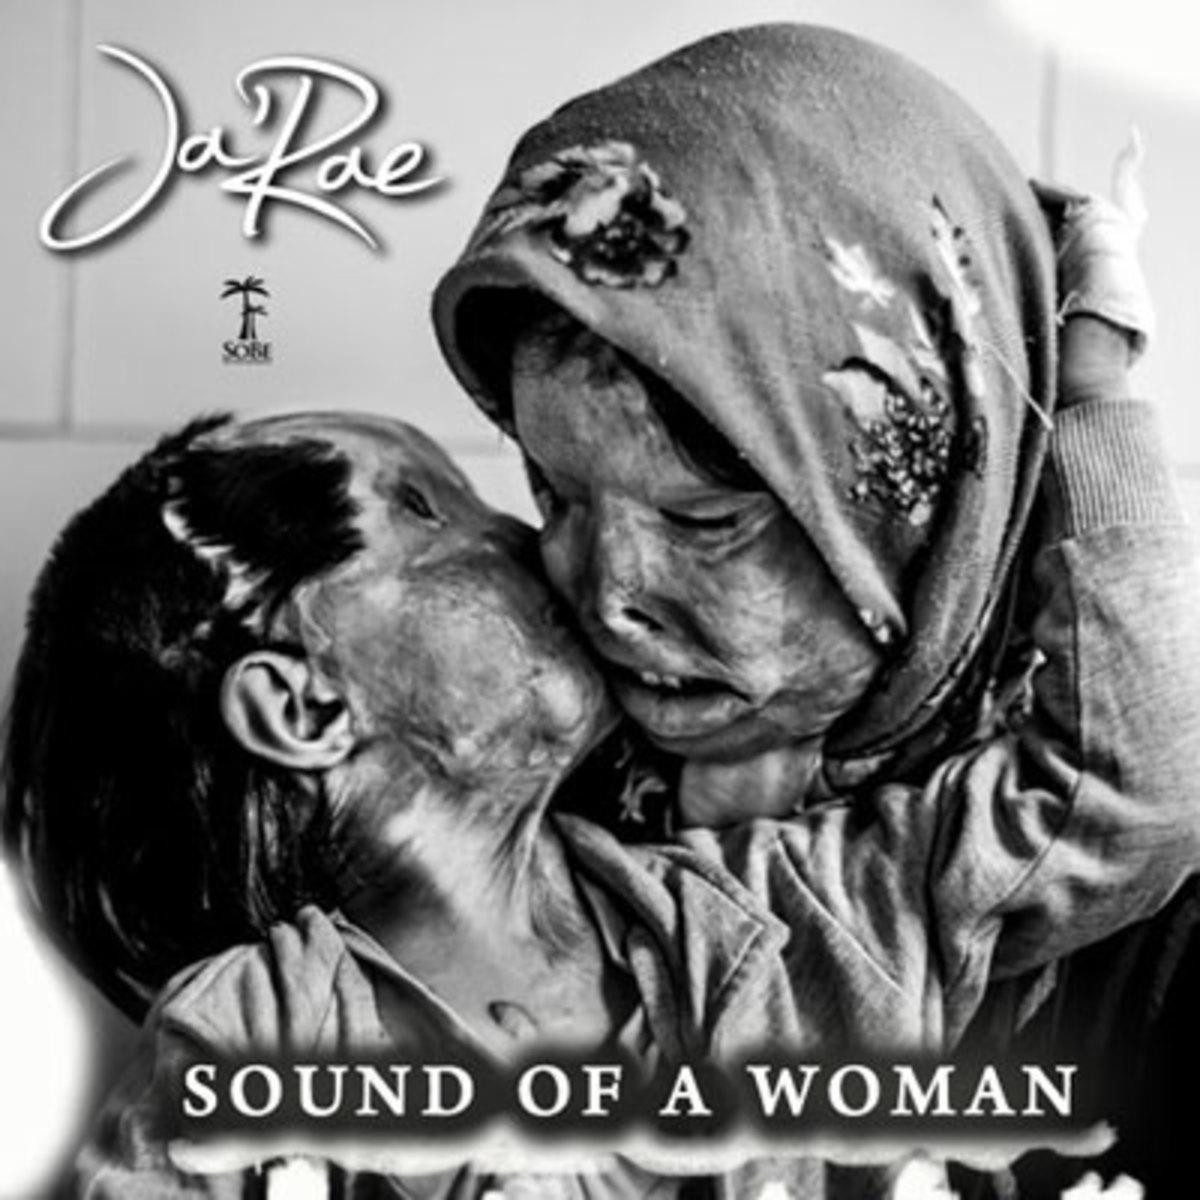 jarae-soundofawoman.jpg